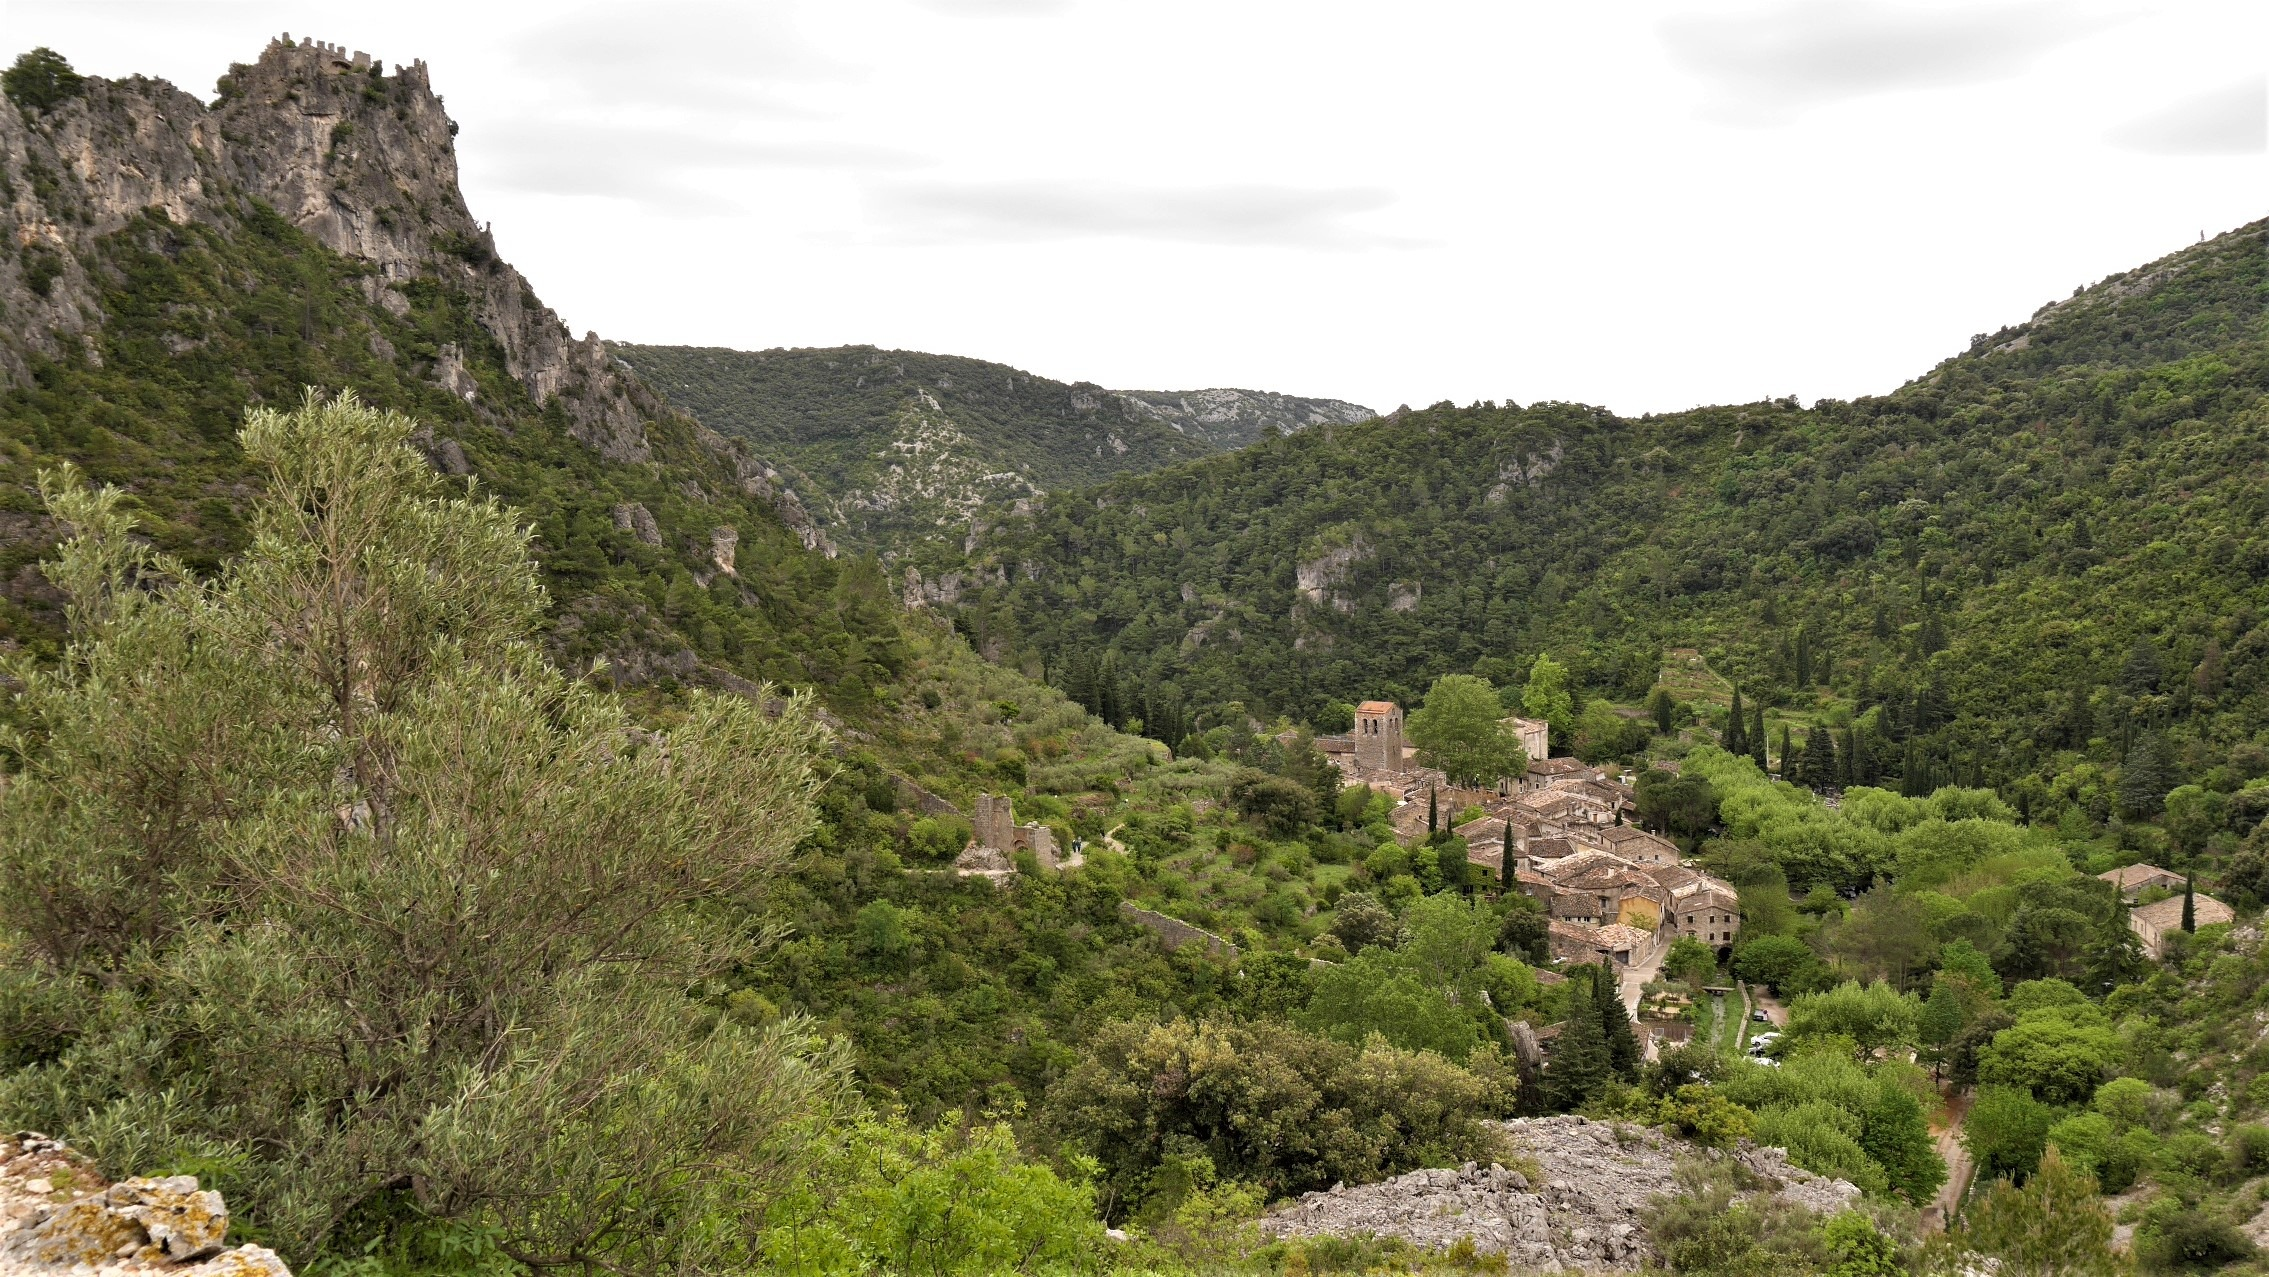 Saint Guilhem le desert visiter chateau geant blog voyage france